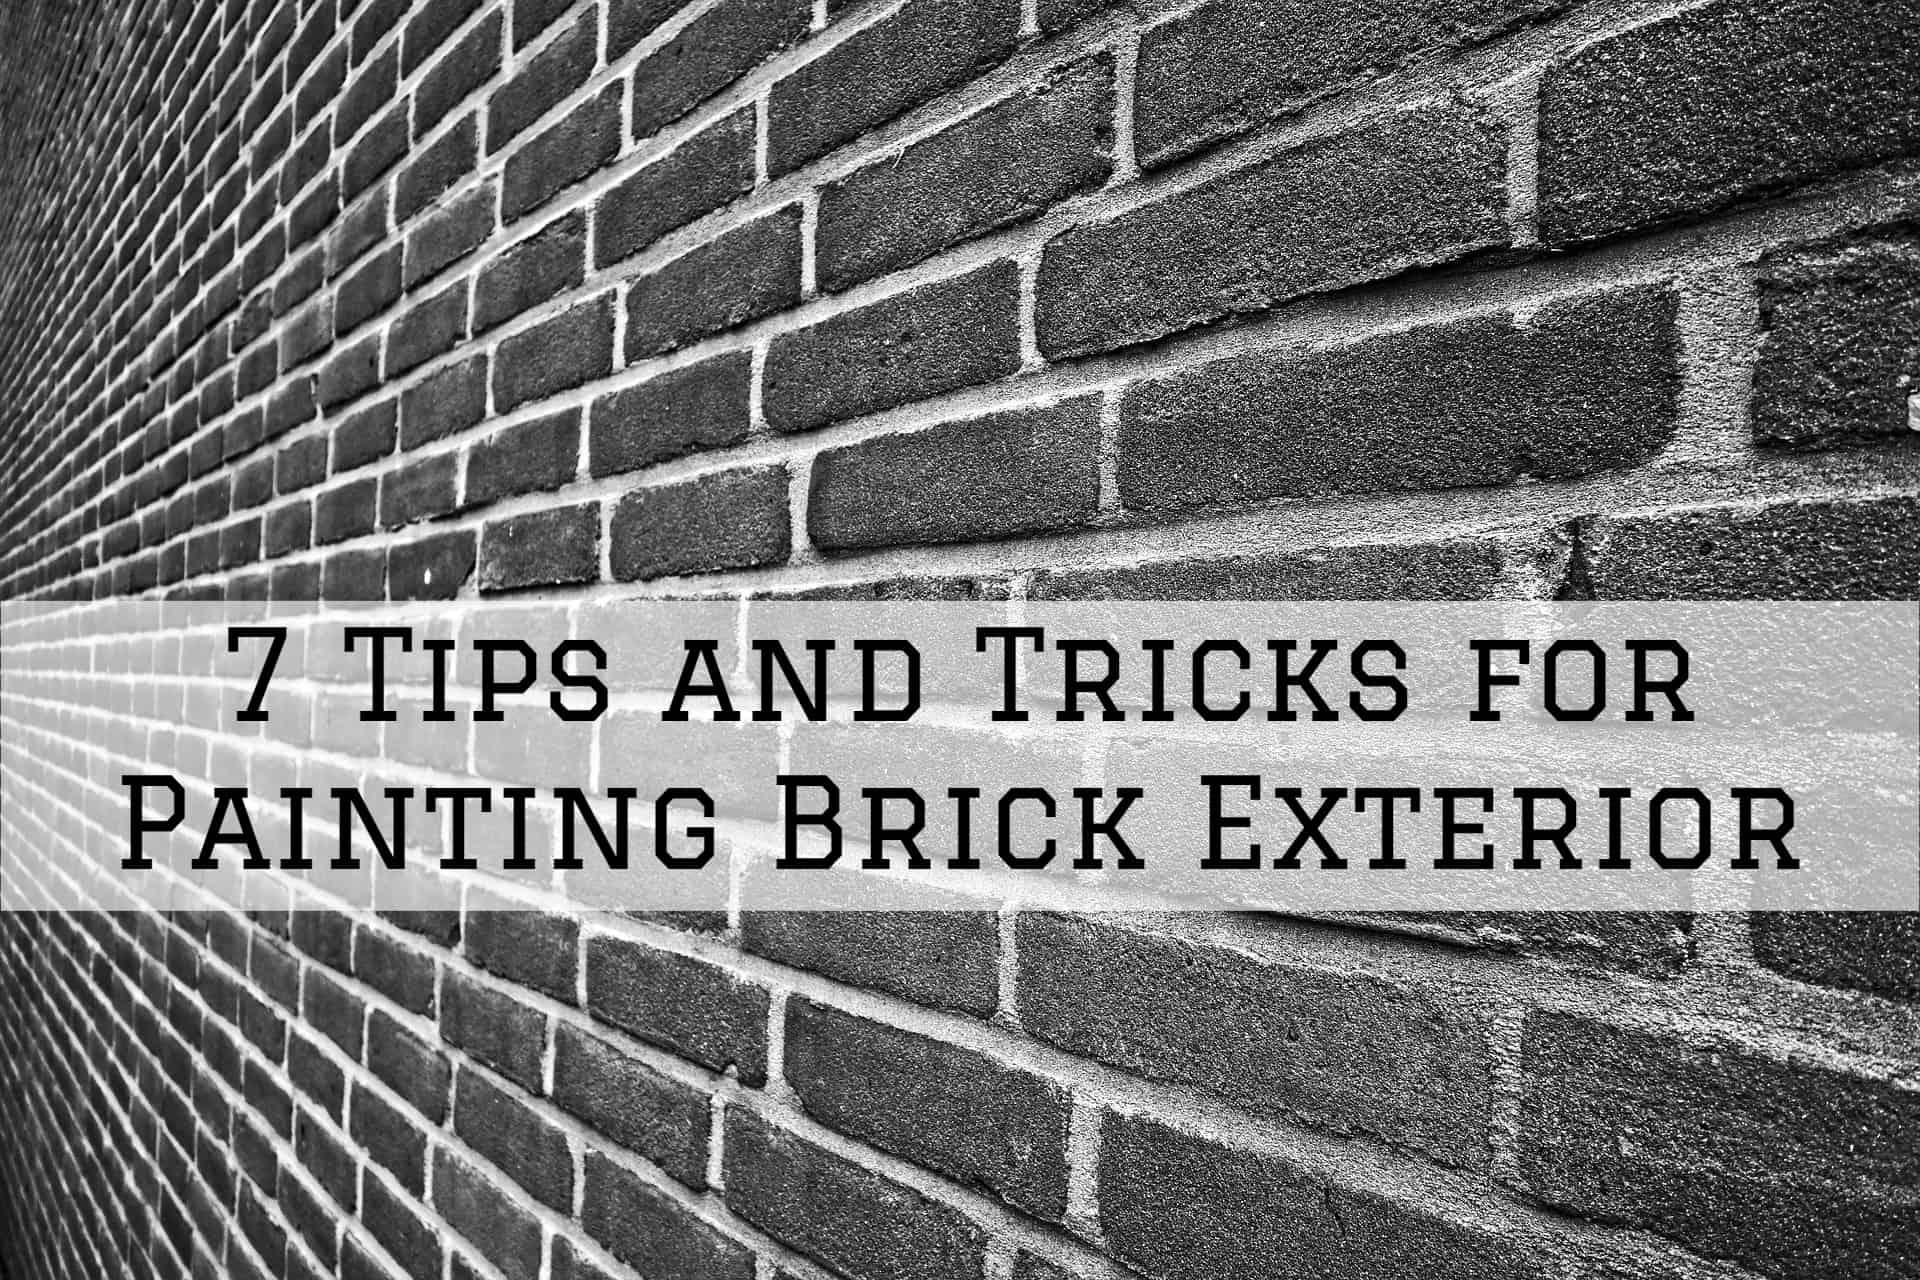 2020-02-10 Brush and Roll Painting Omaha NE Exterior Brick Painting